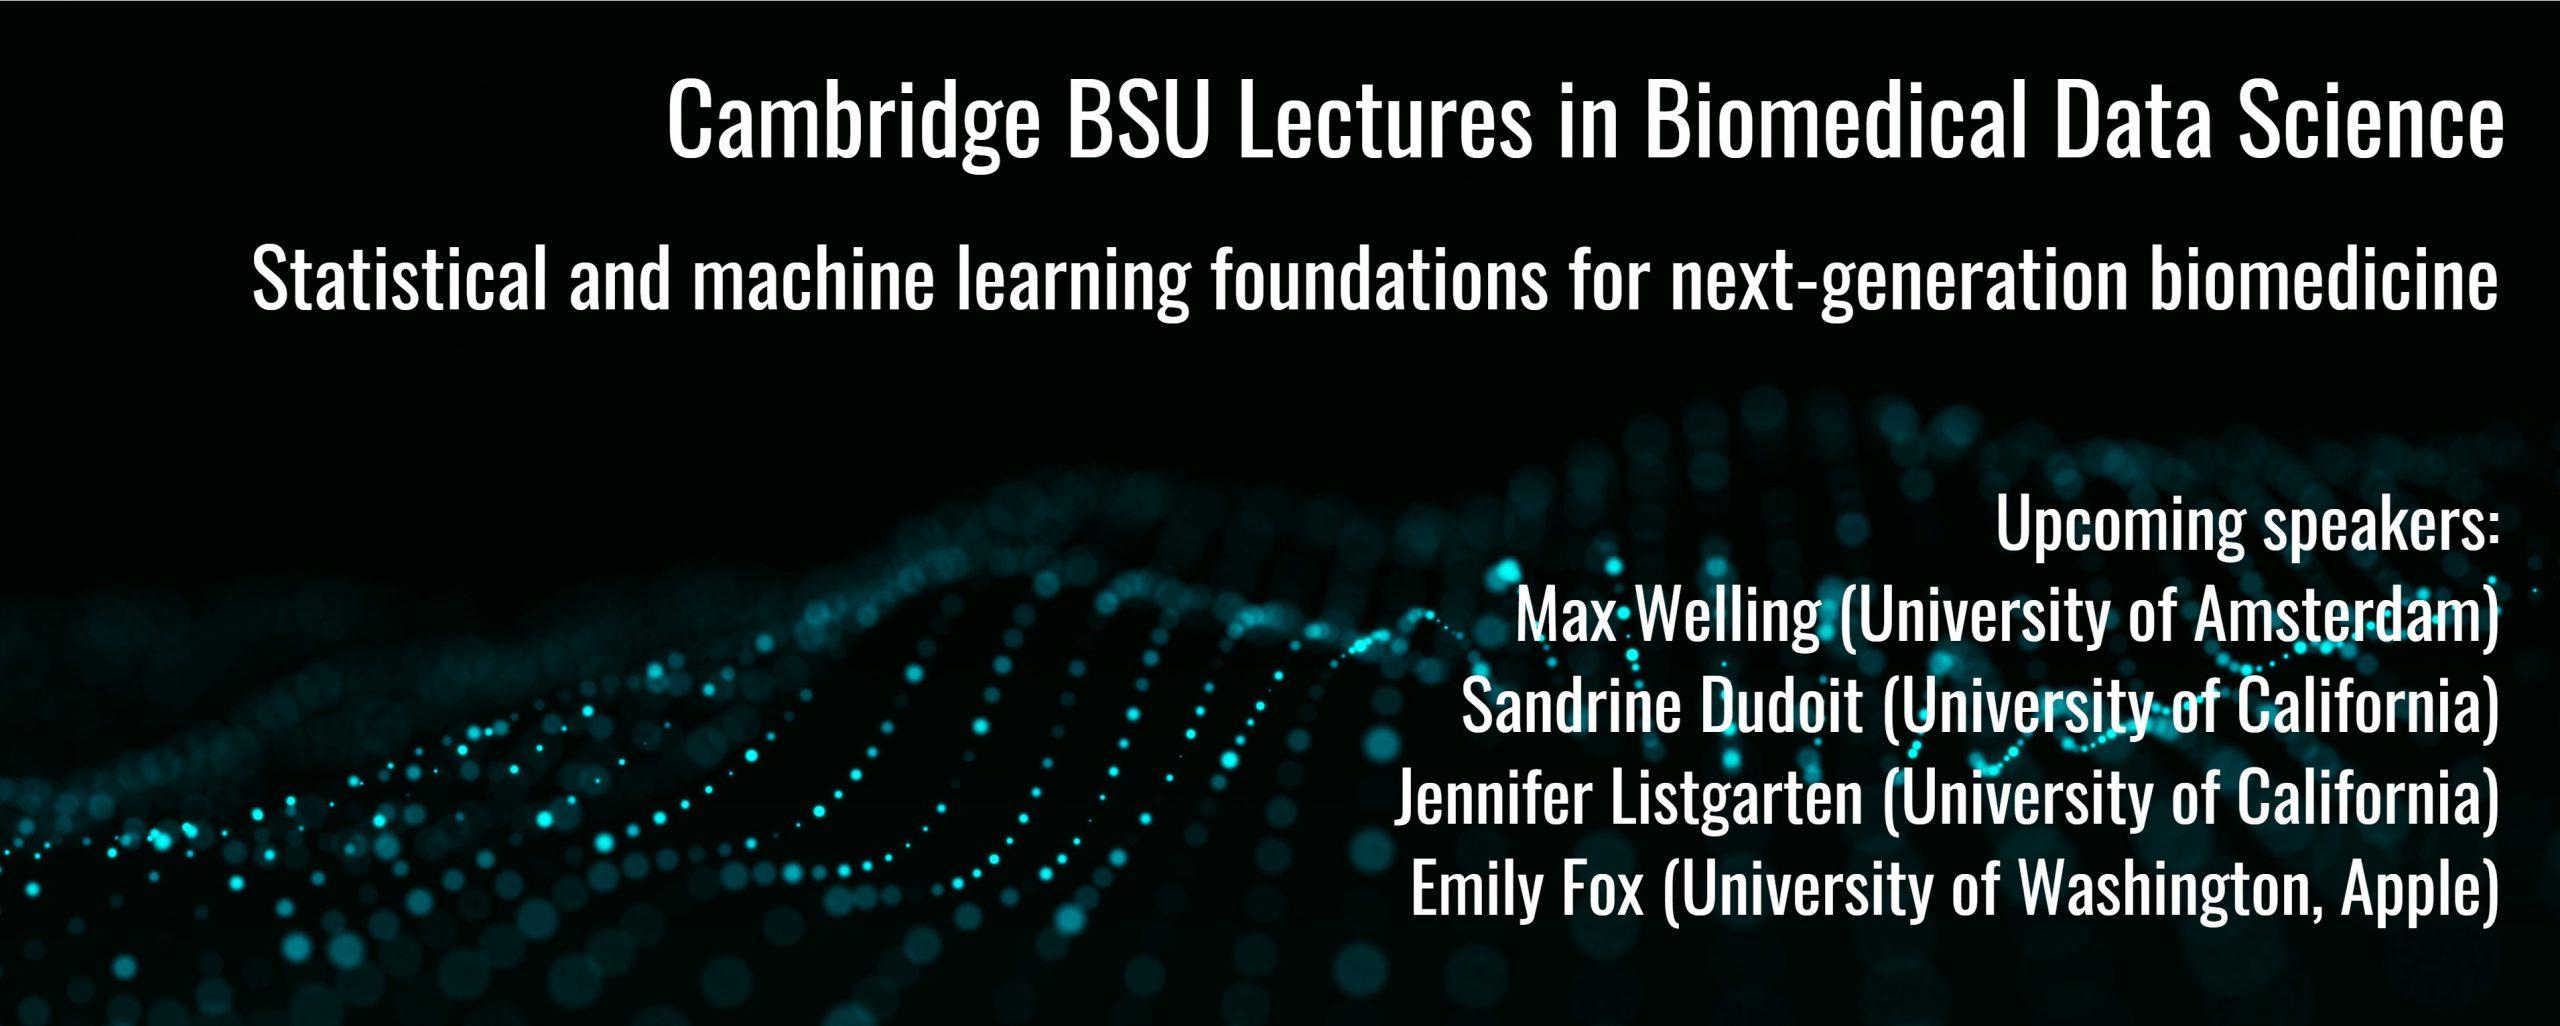 Cambridge BSU Lecture in Biomedical Data Science